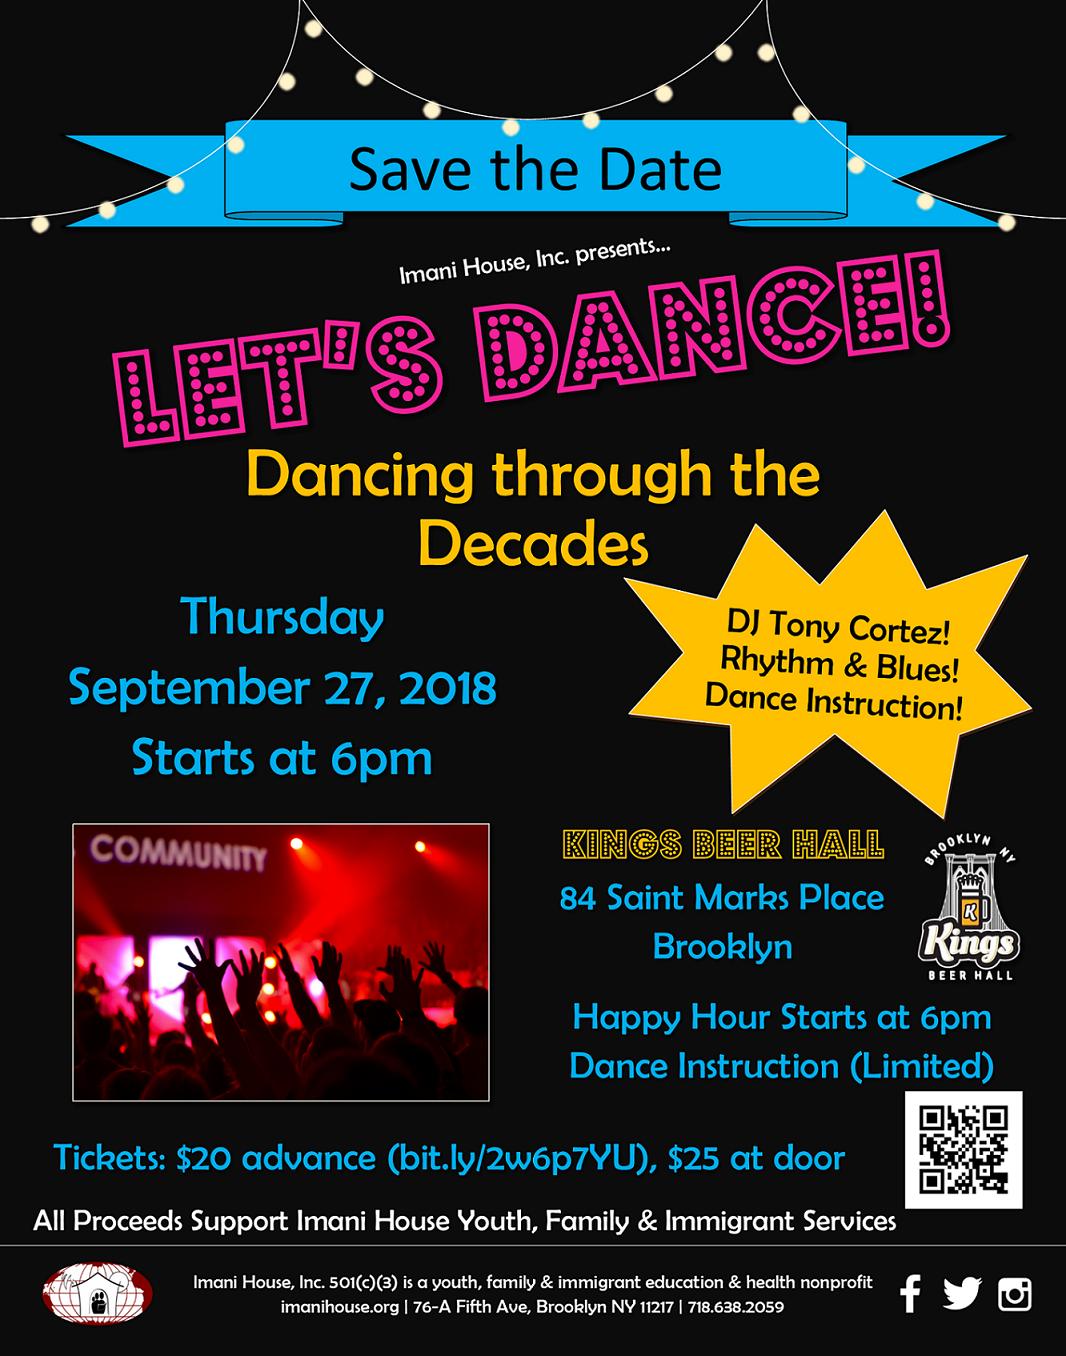 Let's Dance Sept 27, 2018 - Imani House